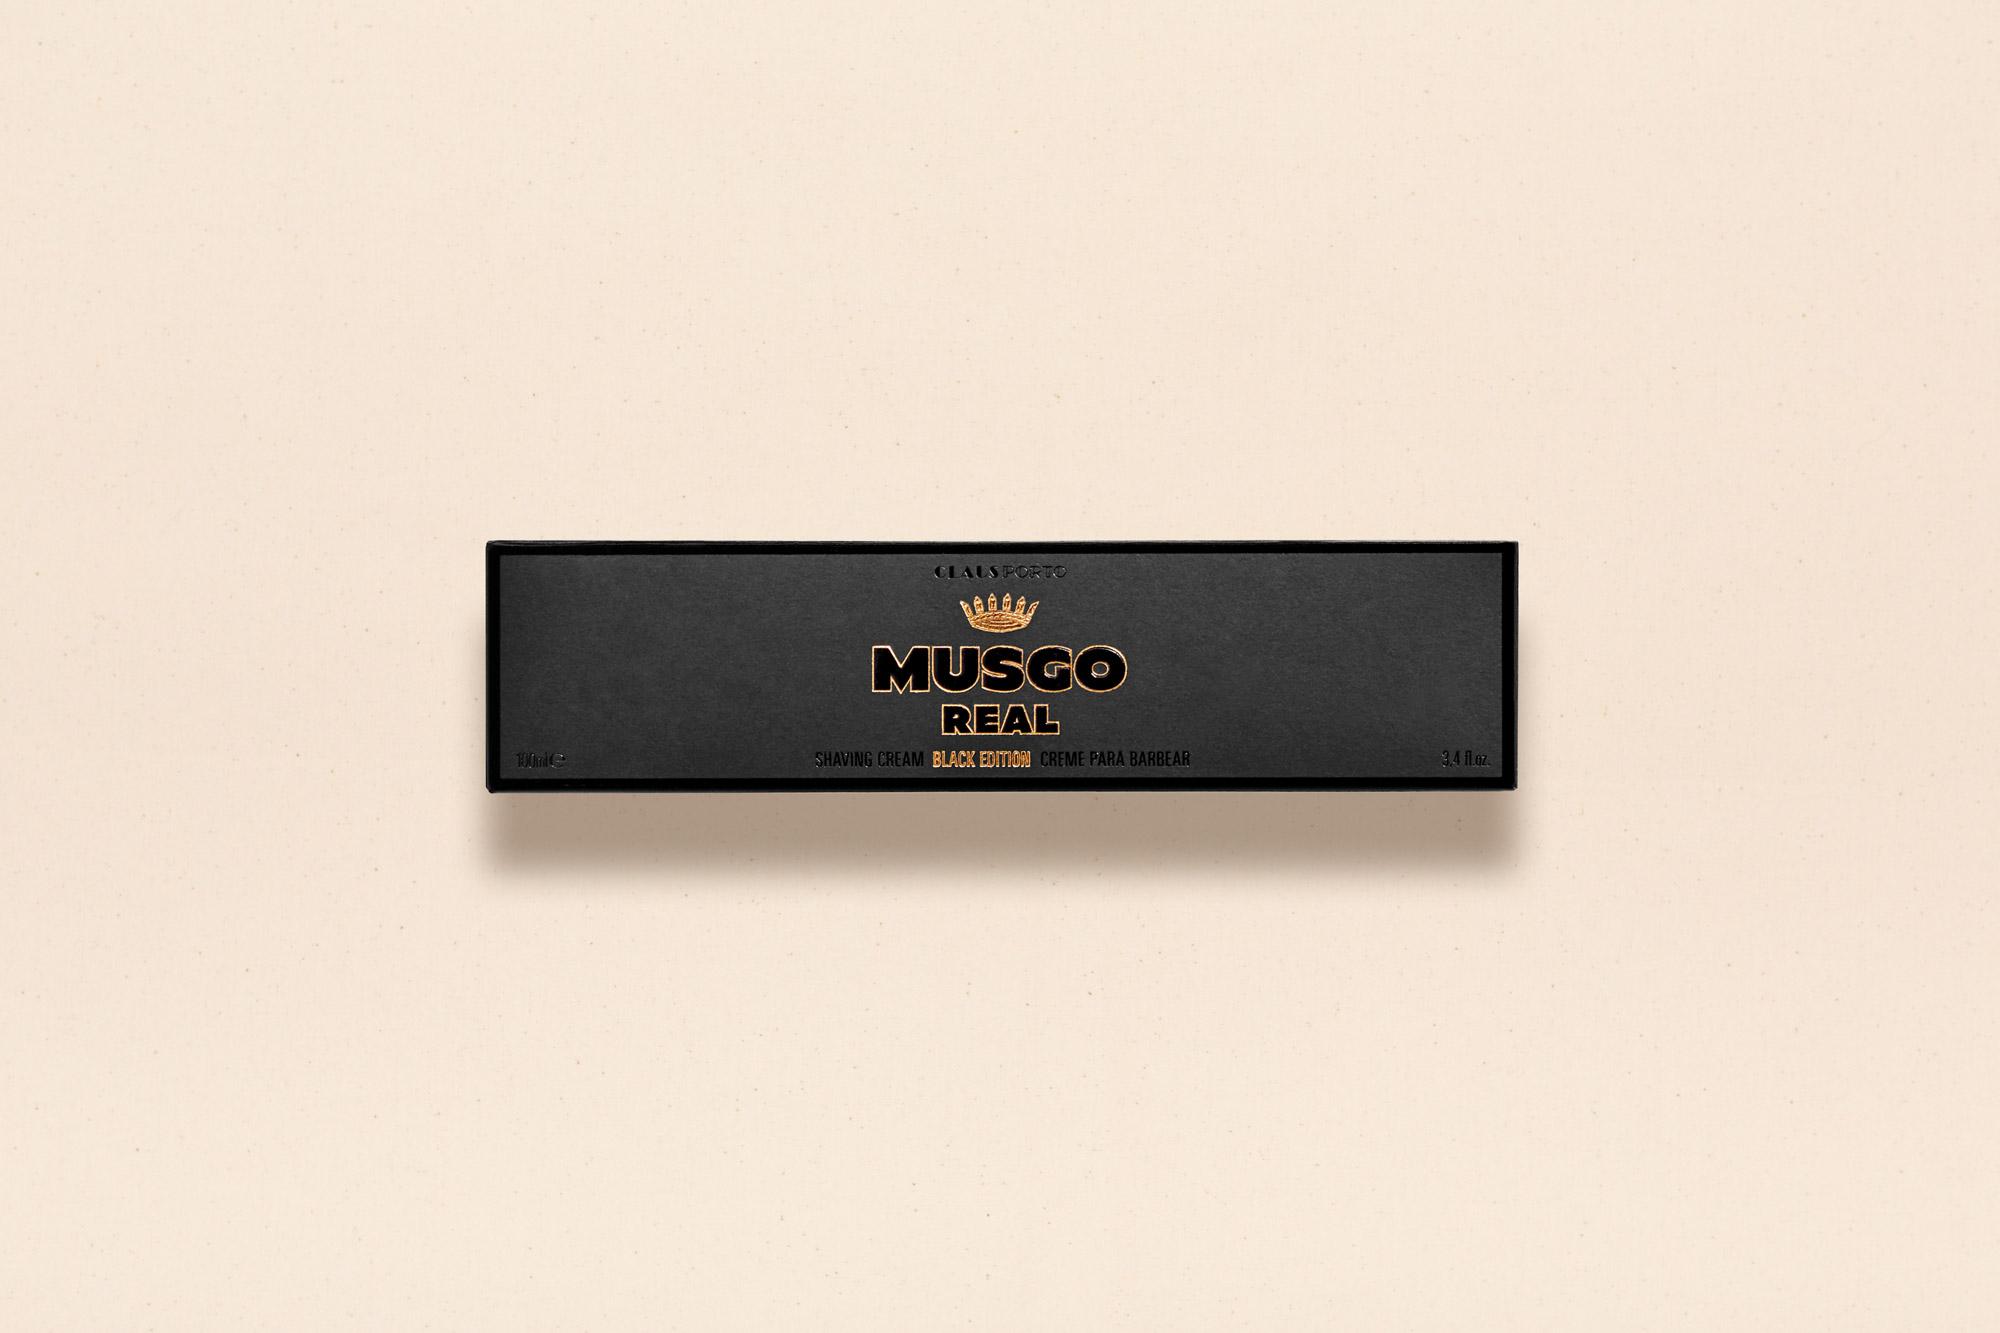 MRSC009_1